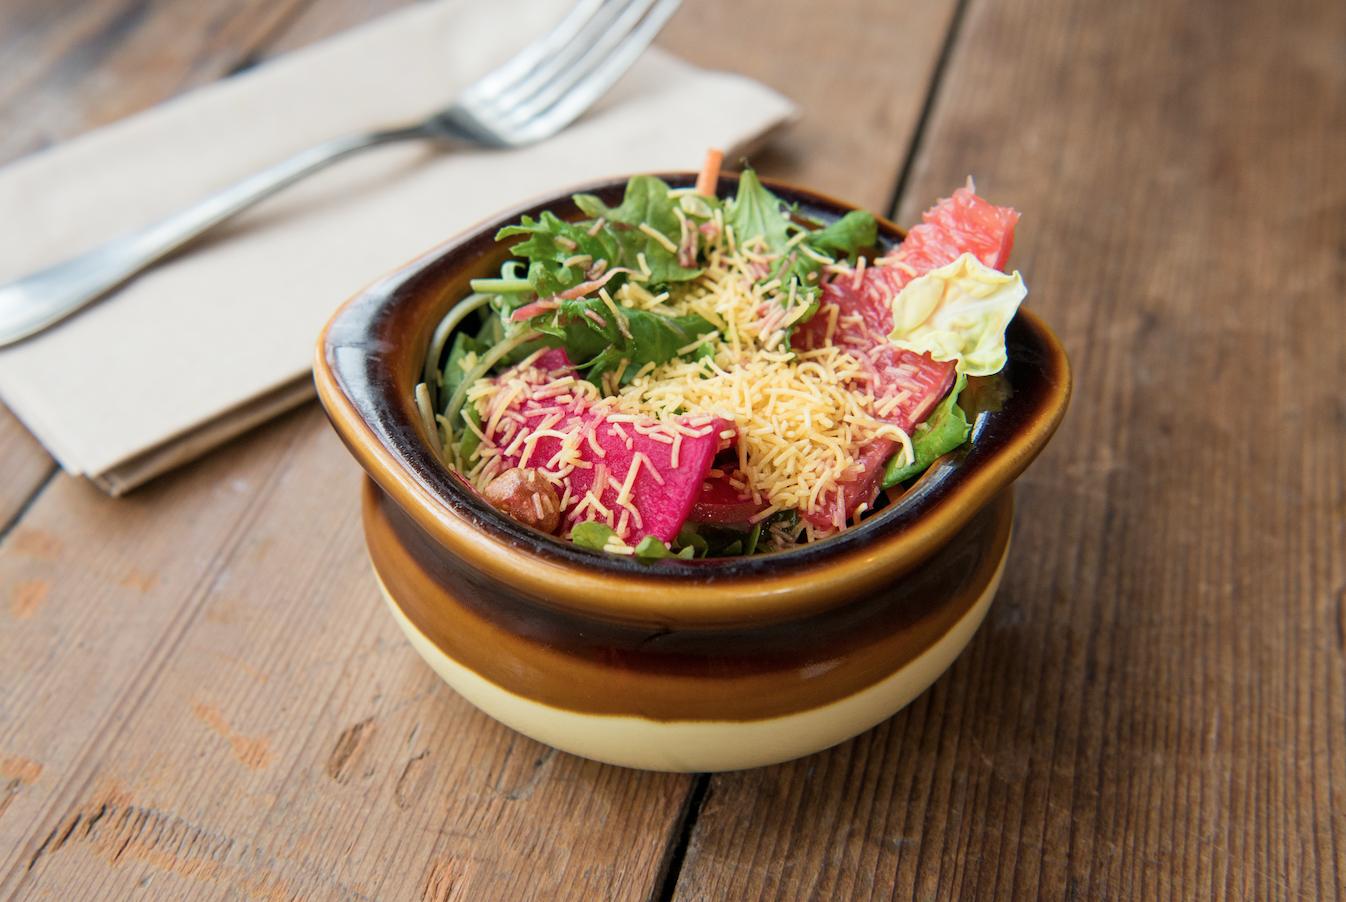 SIDES & EXTRAS   kulcha naan (VG) - serves 25.....$40 papadum & pico kachumber (V) - serves 25.....$30 side salad small (V)- serves 25.....$50 side salad large (V) - serves 40.....$85 cilantro chutney (V) - 12 oz.....$8 tamarind chutney (V) - 12 oz.....$8 raita (VG) - 12 oz.....$8 napkin, plate, spork.....$1/person